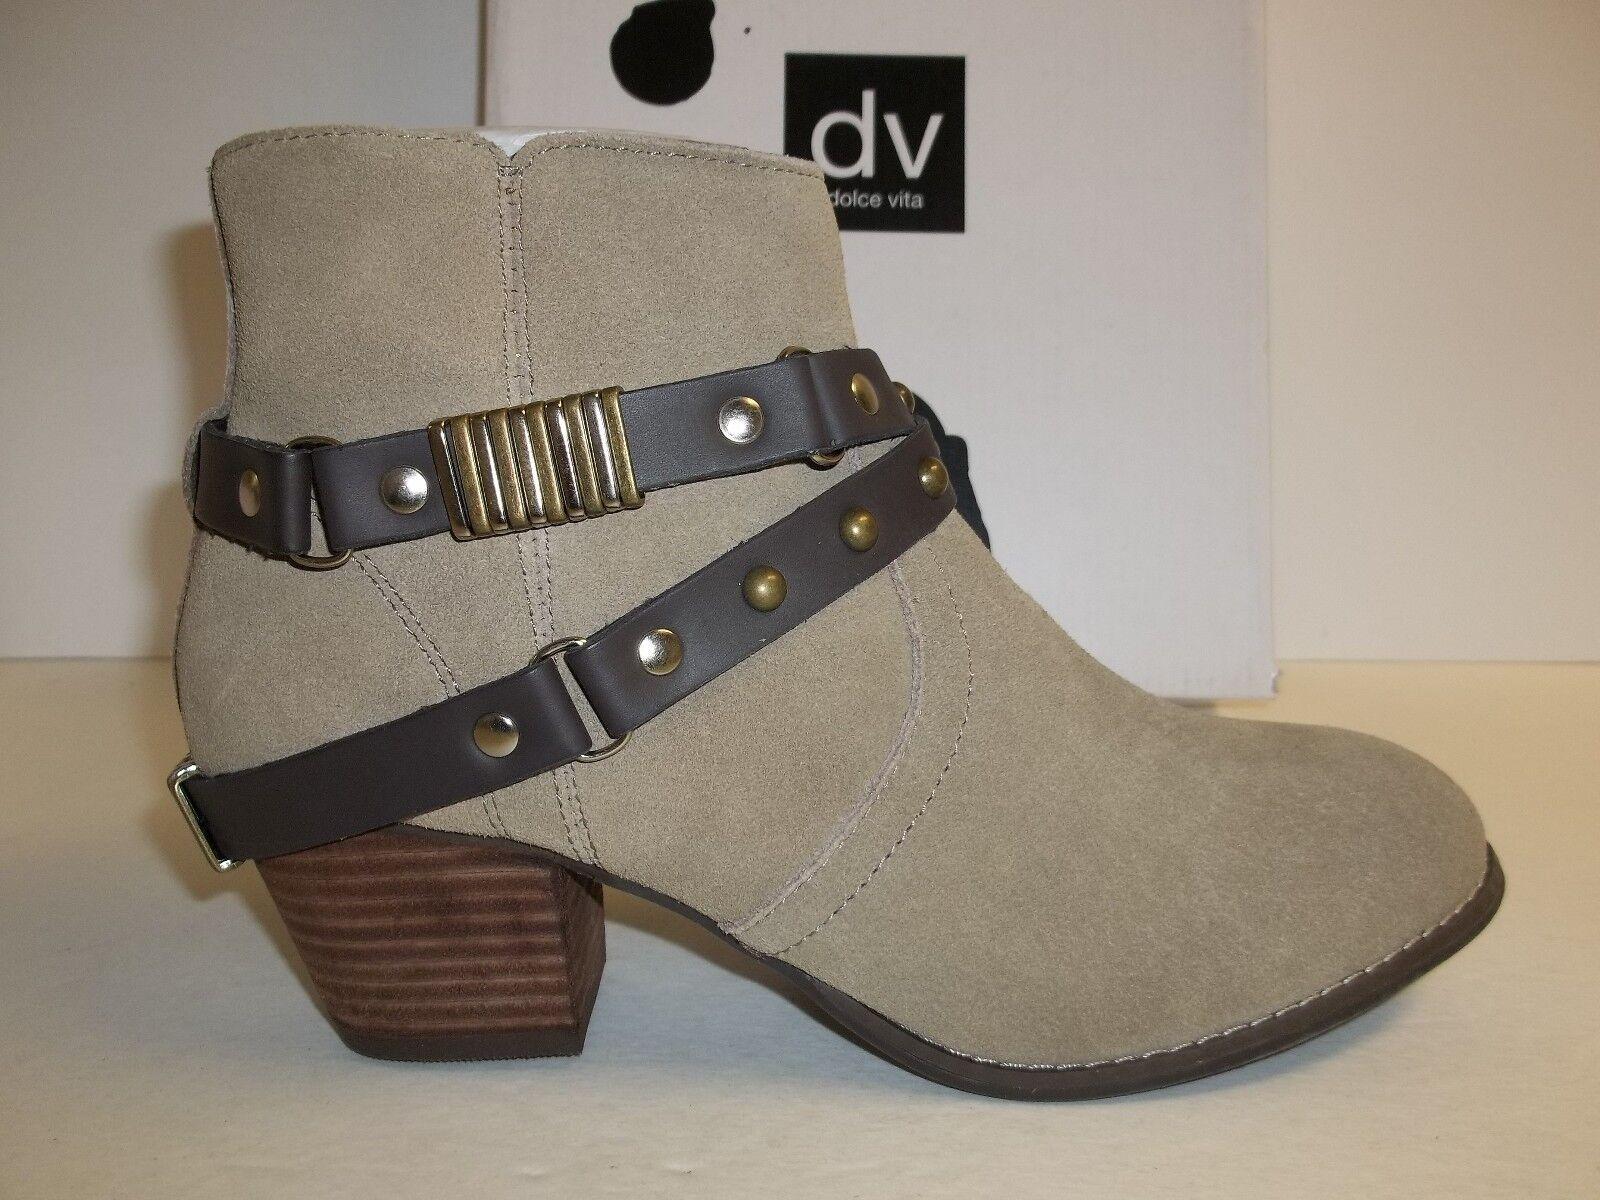 Dolce Vita DV Größe 8 M Jacy Taupe Suede Ankle Stiefel NEU Damenschuhe Schuhes